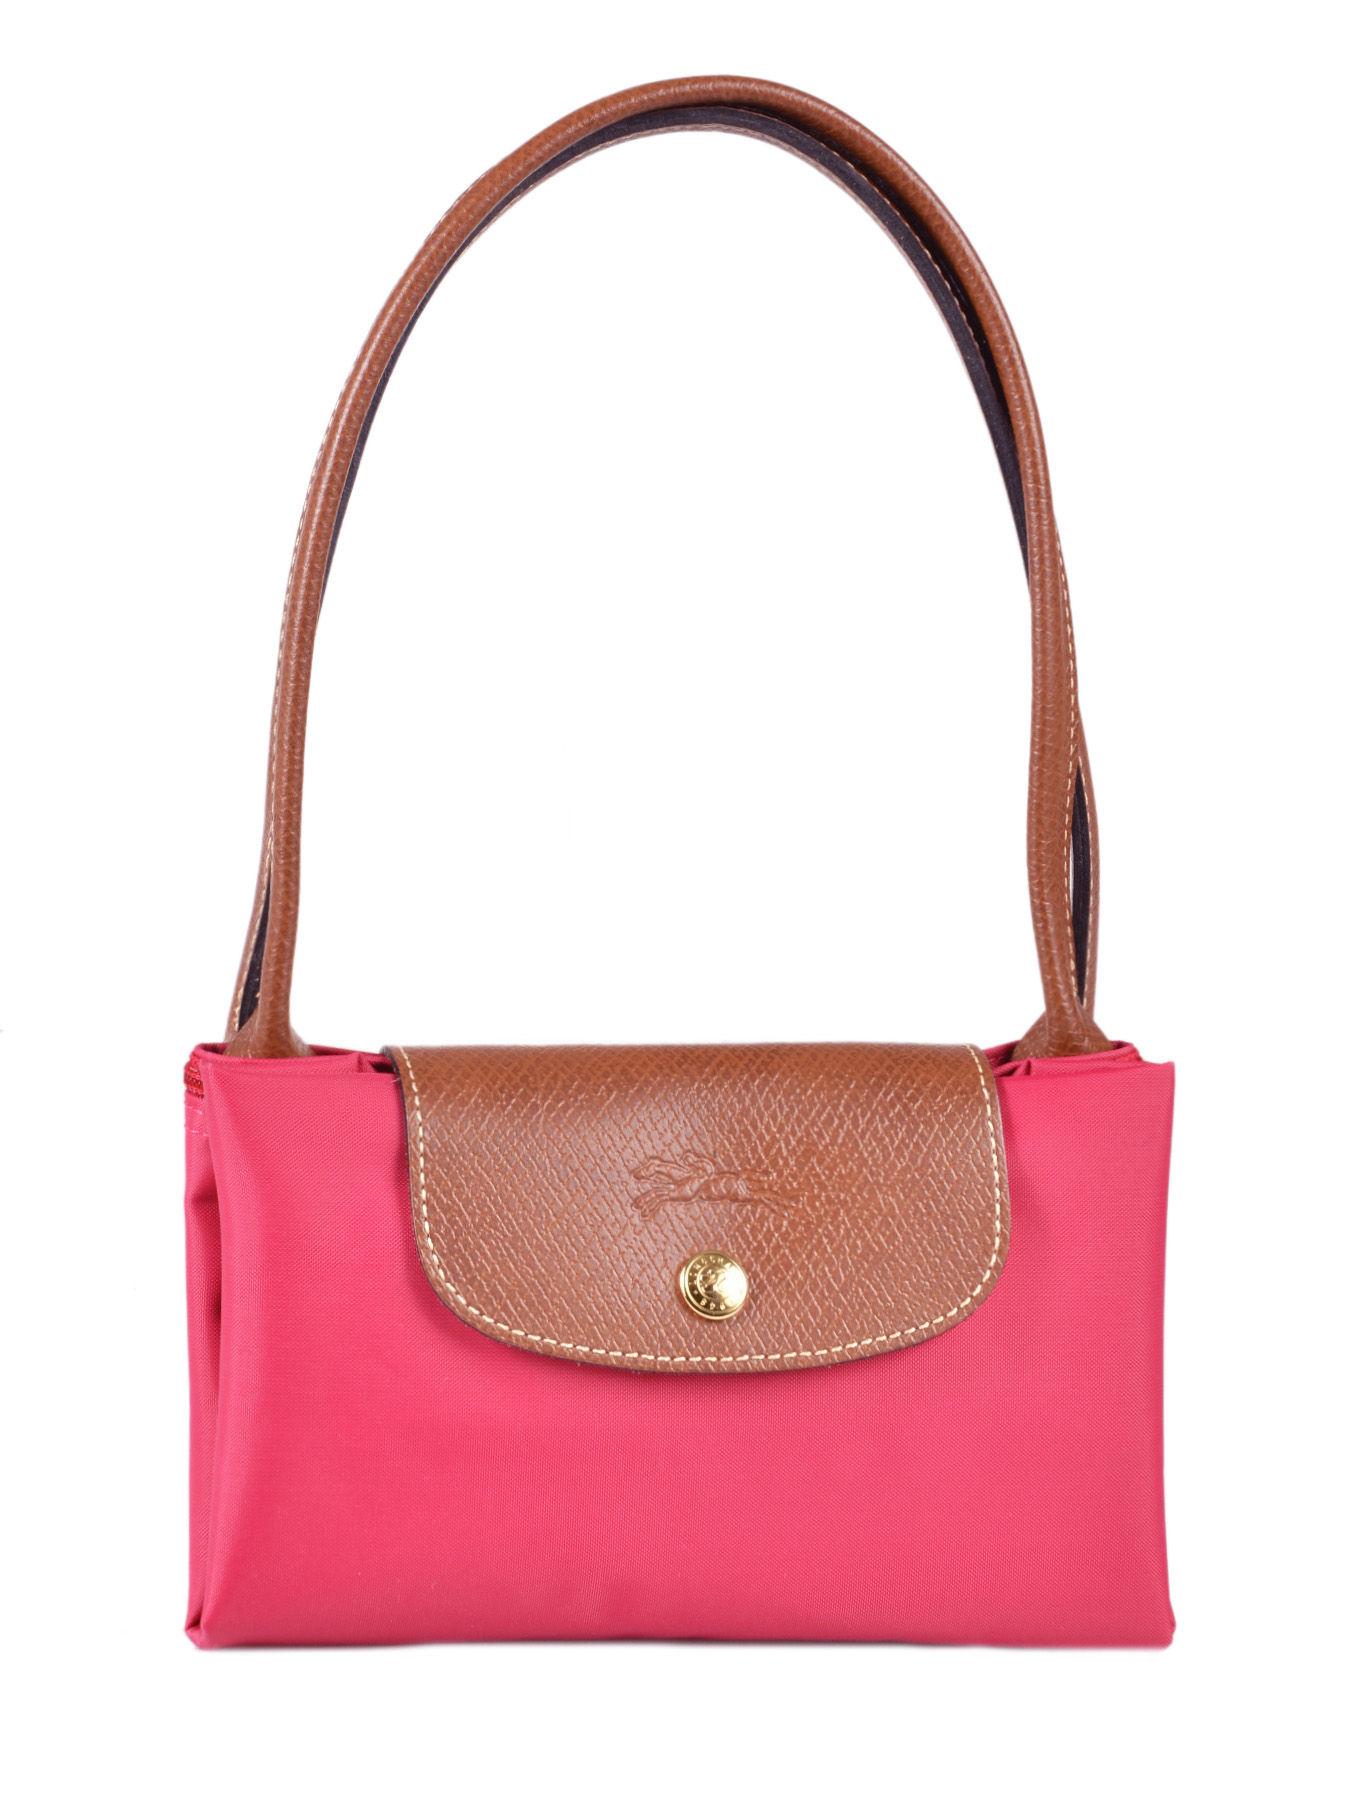 Sac Longchamp Besace Rose : Sac longchamp rose le pliage toile